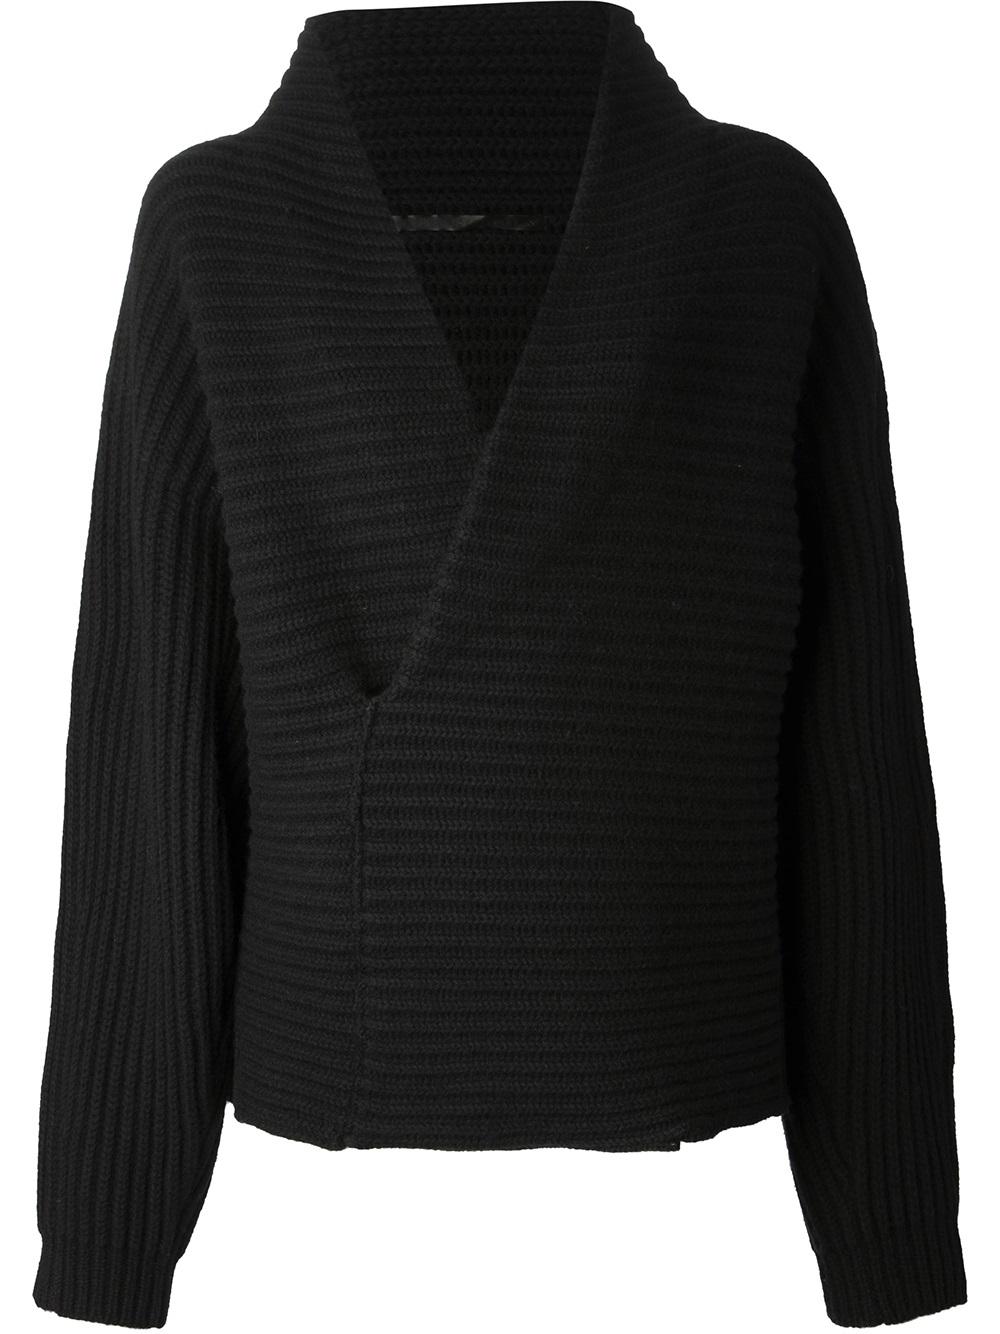 lyst haider ackermann shawl collar sweater in black. Black Bedroom Furniture Sets. Home Design Ideas